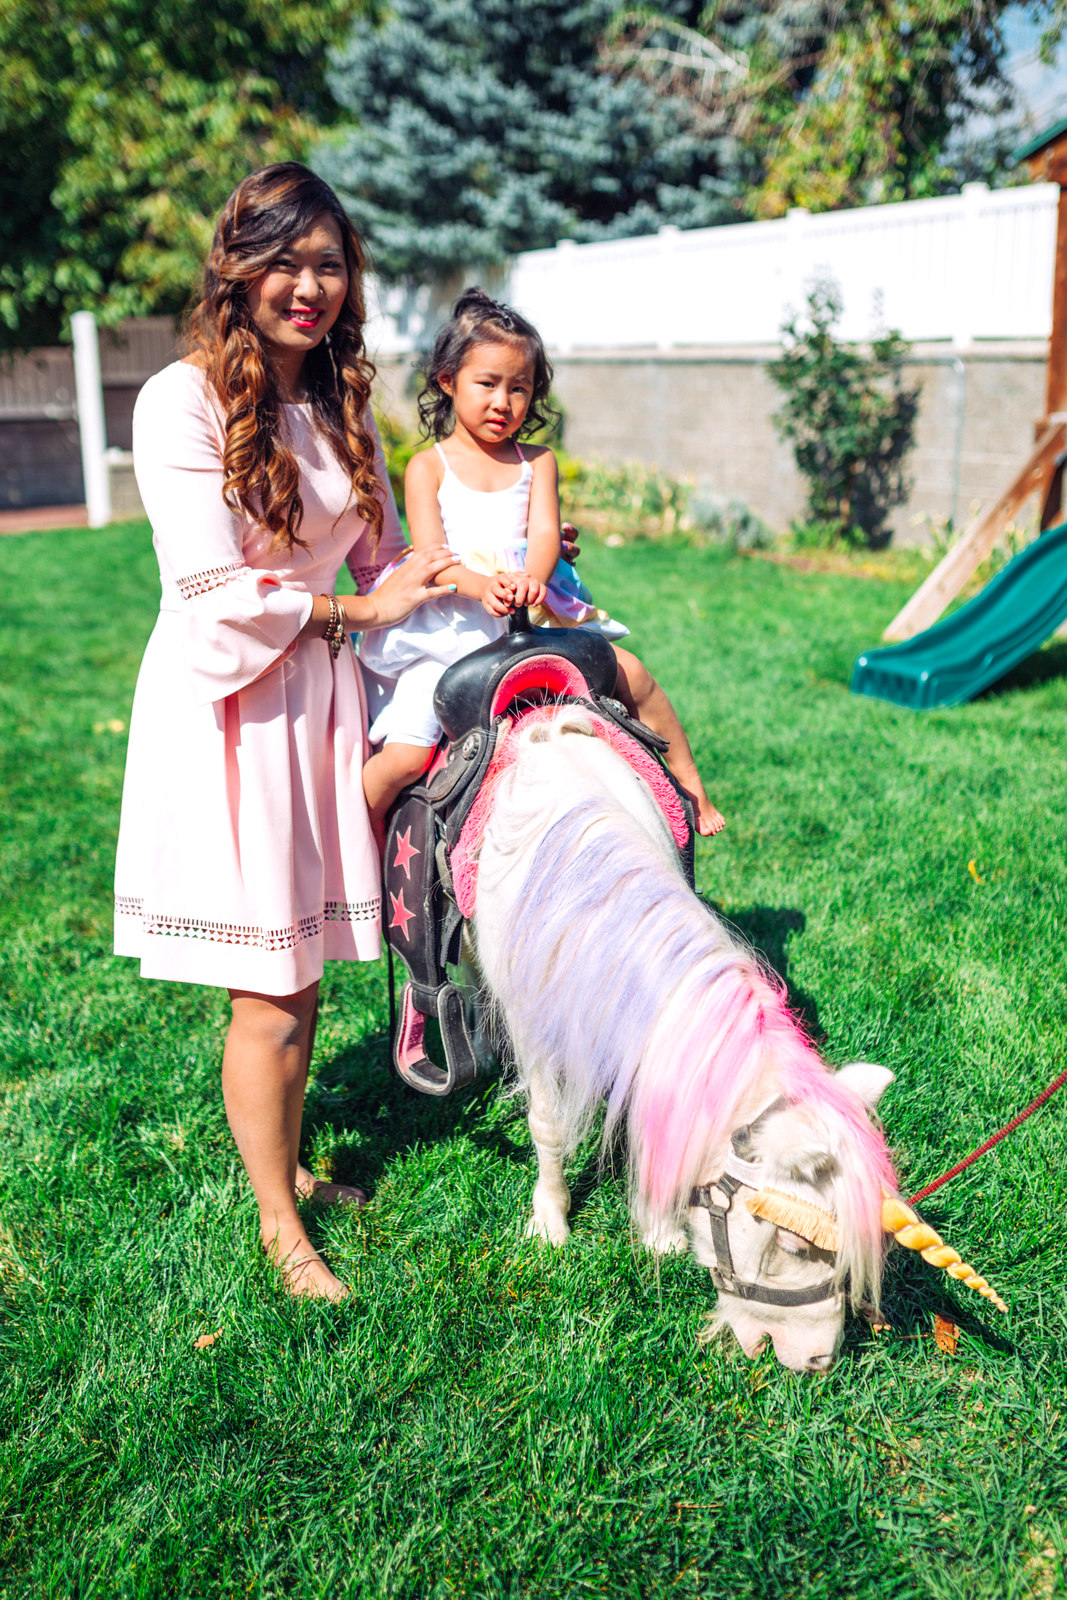 A Magical Unicorn Birthday Party - Vivian's 3rd Birthday! by Utah mom blogger Sandy A La Mode